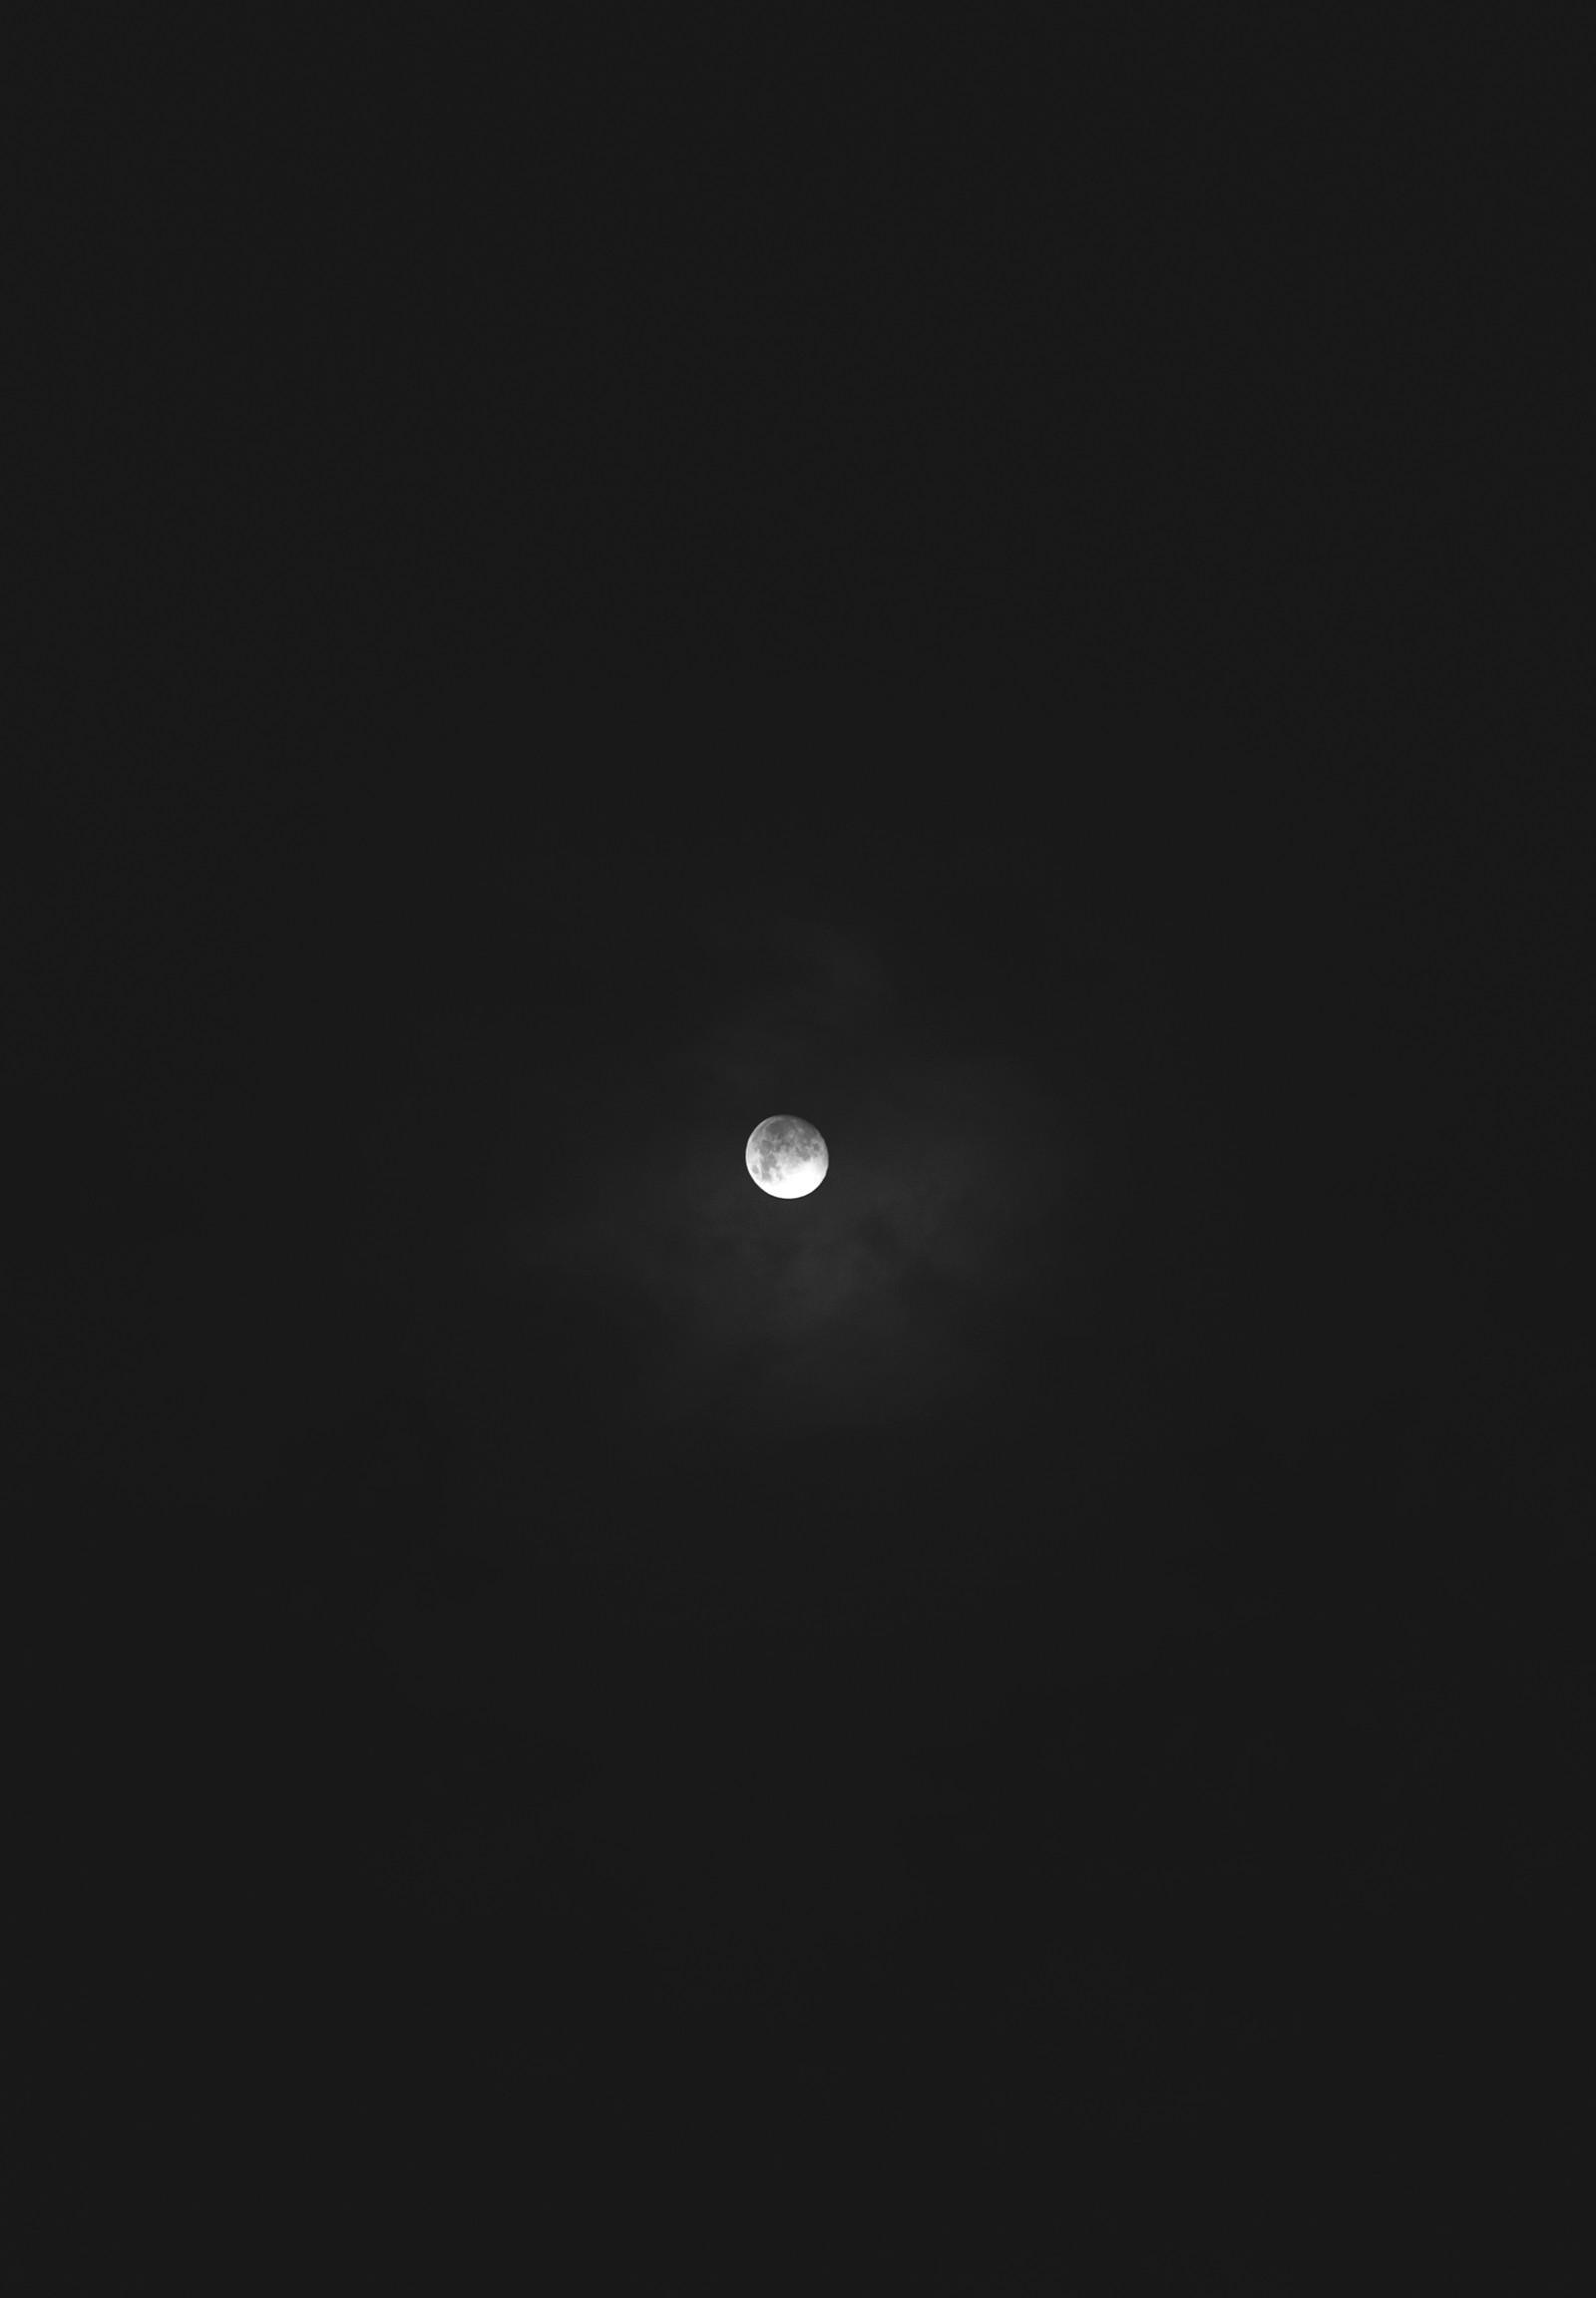 Sky, Night, Dark, Black, Hd Grayscale Images, Monochrome Wallpapers, Dark